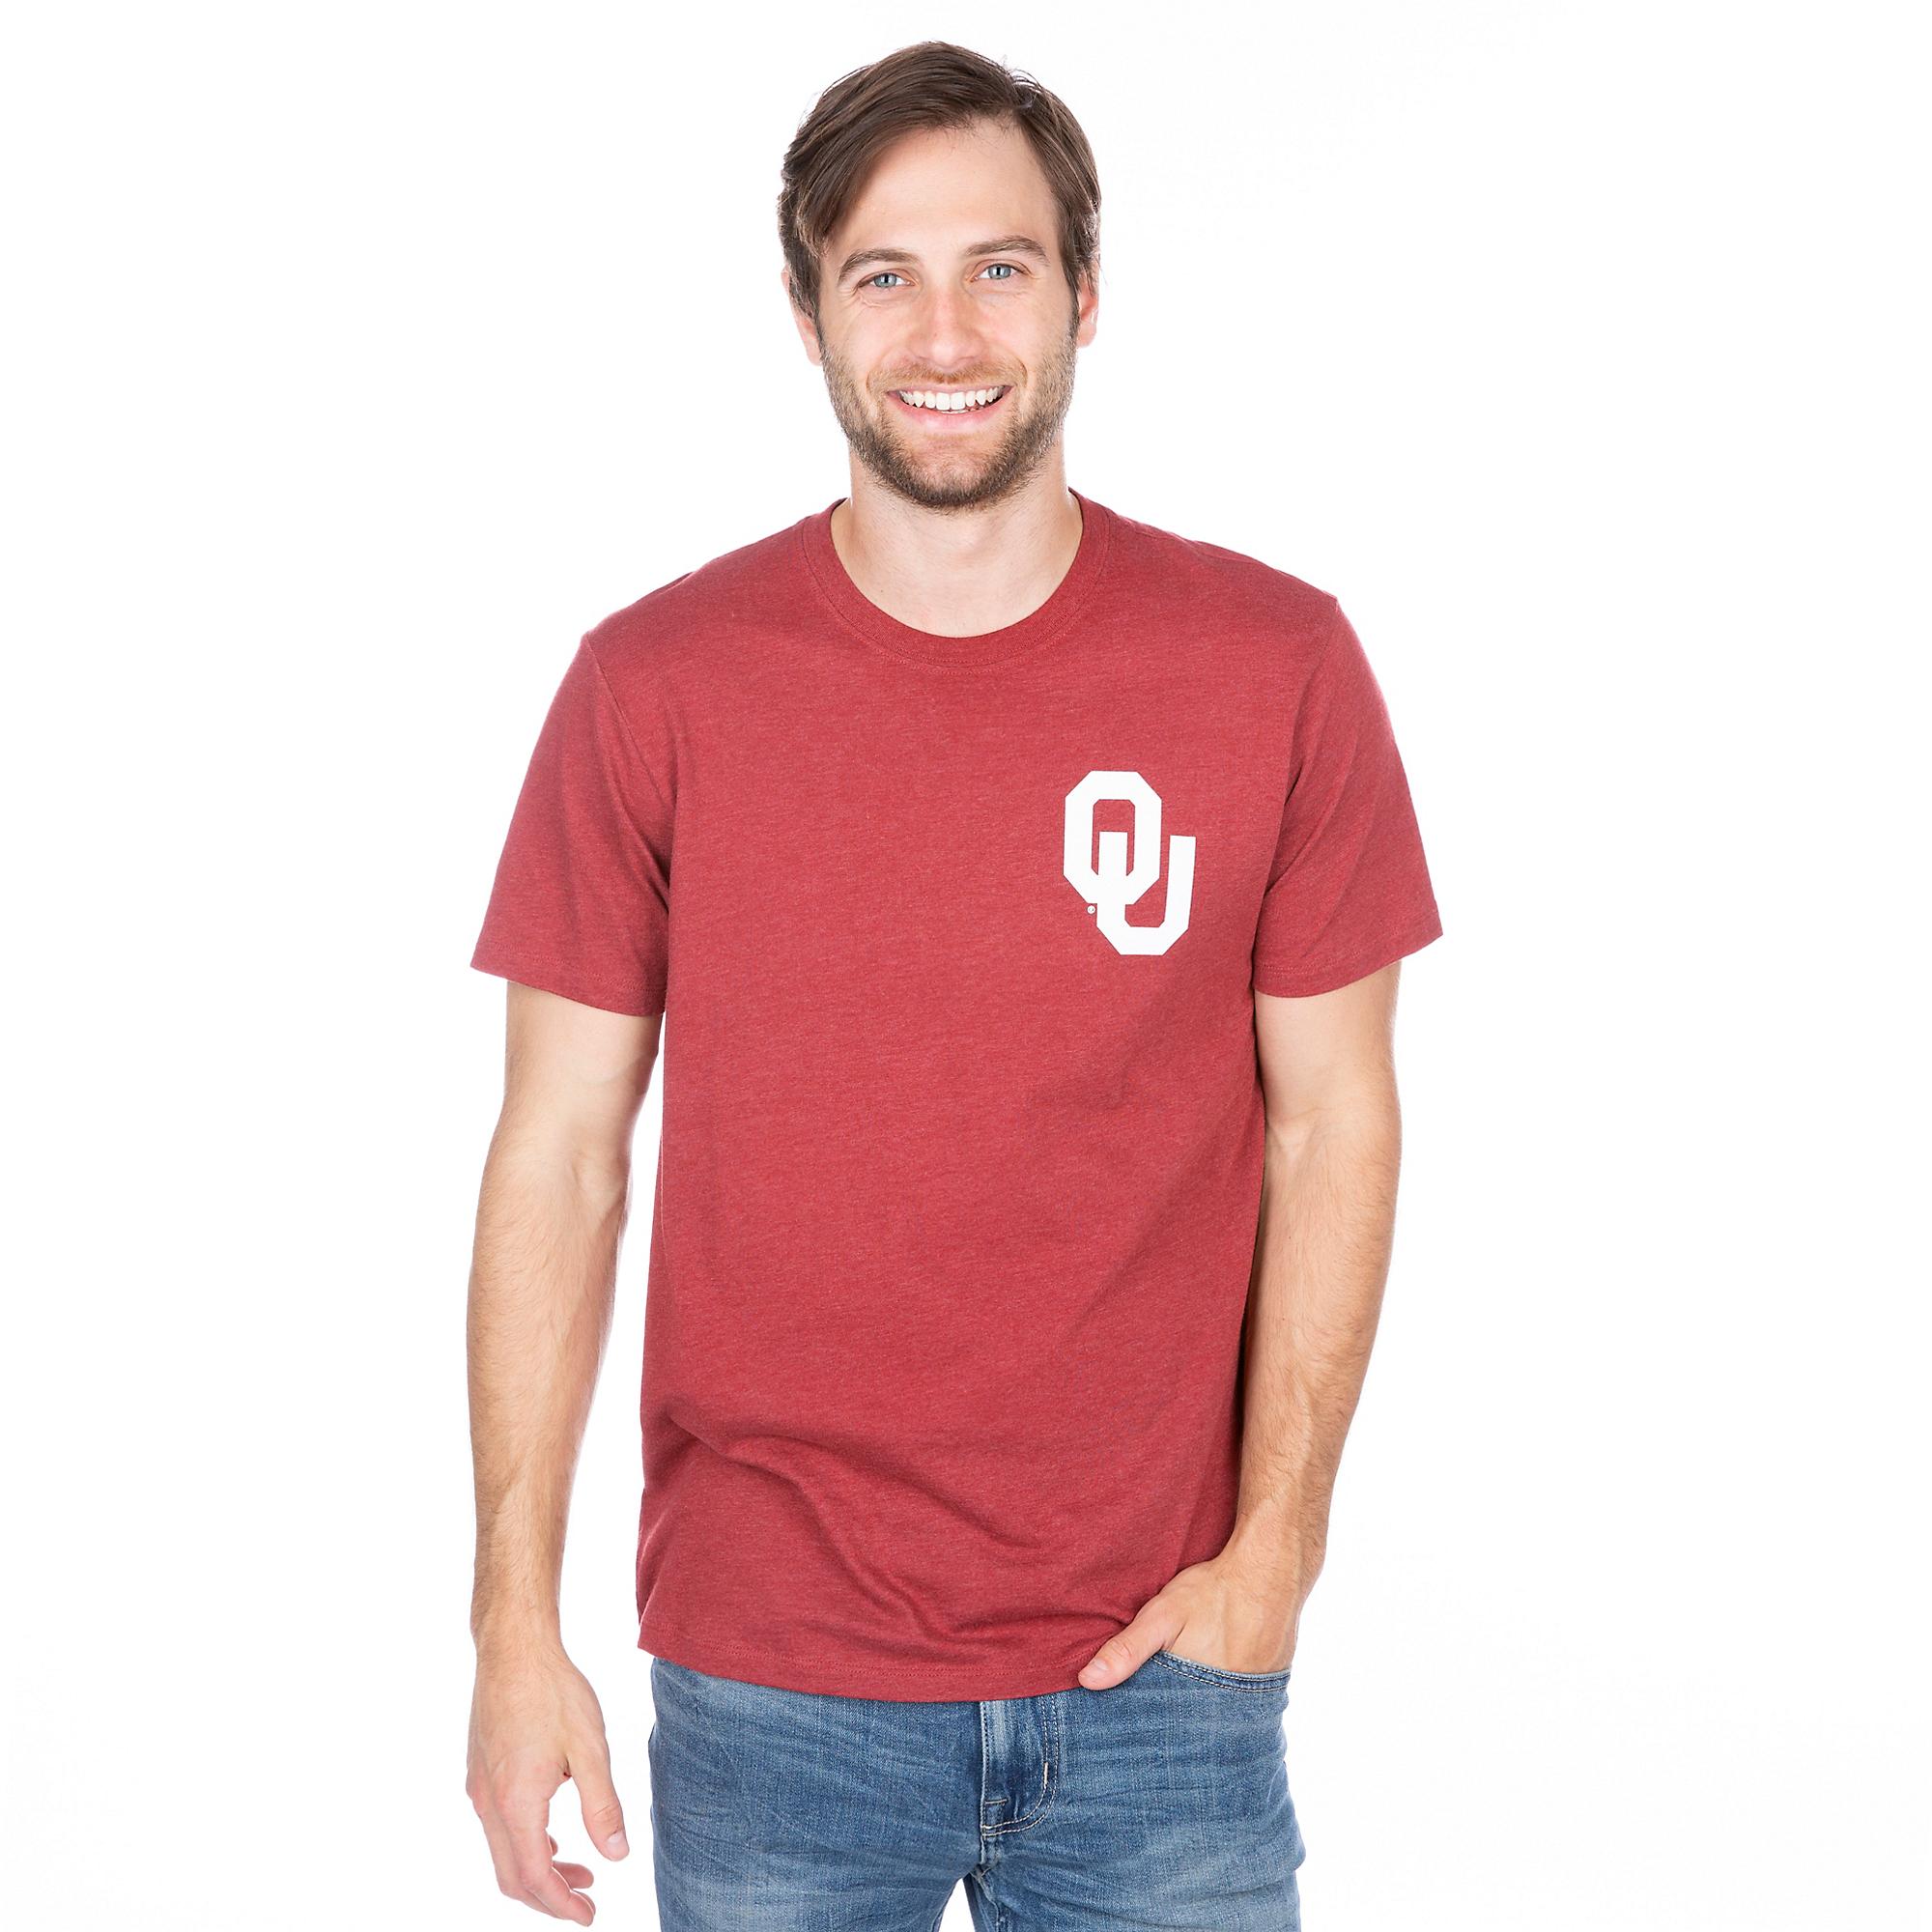 Oklahoma Sooners 47 Backer Club Tee